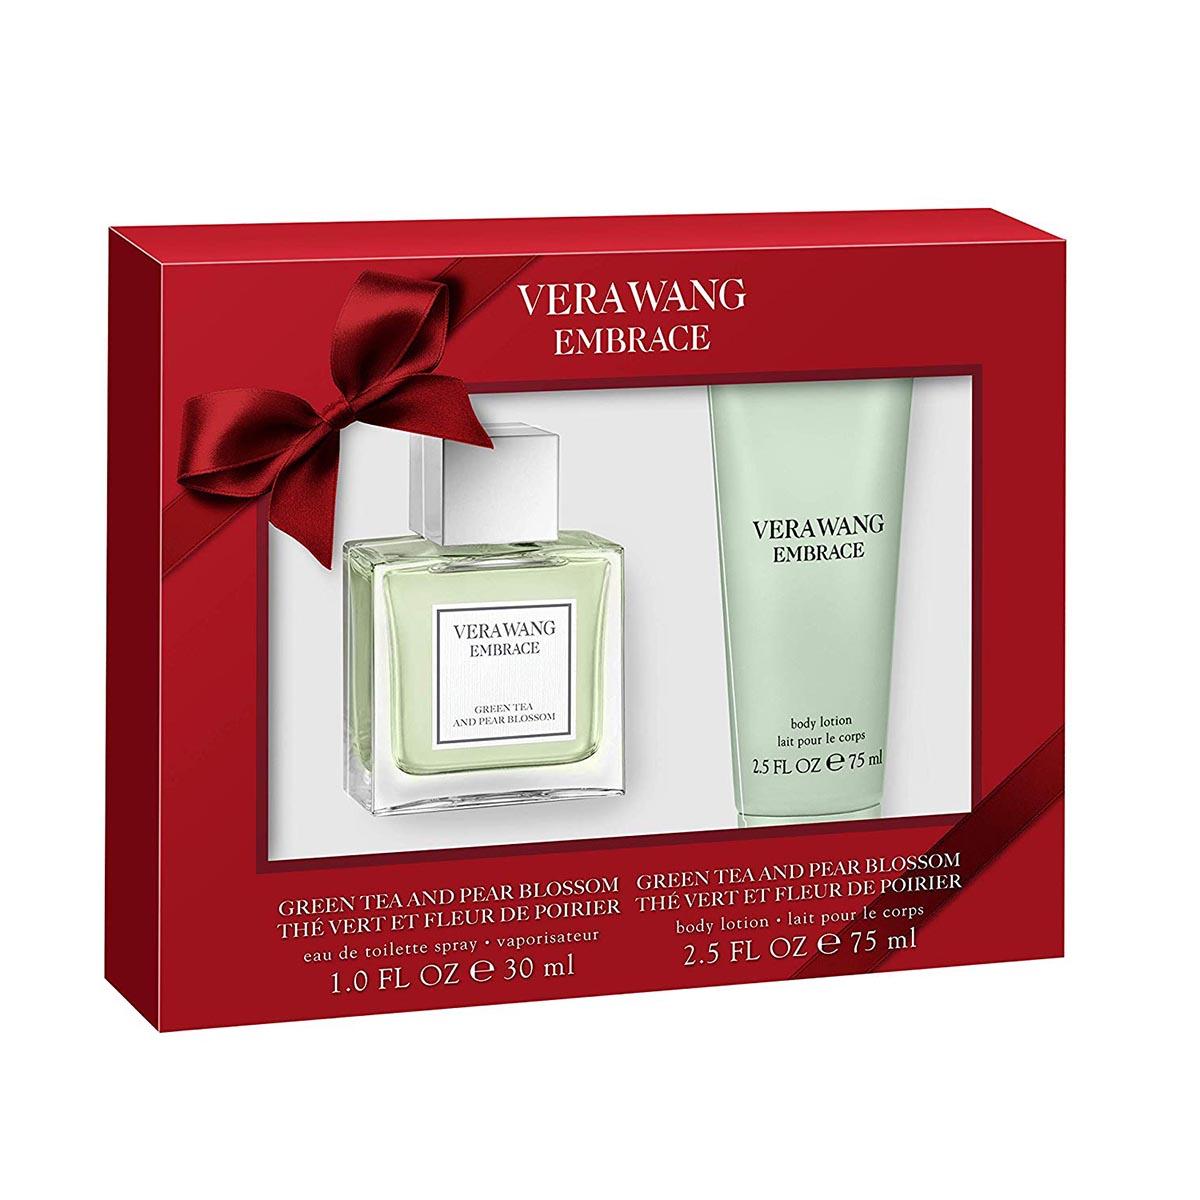 Vera wang embrace green tea and pear blossom eau de toilette 30ml locion corporal perfumada 75ml